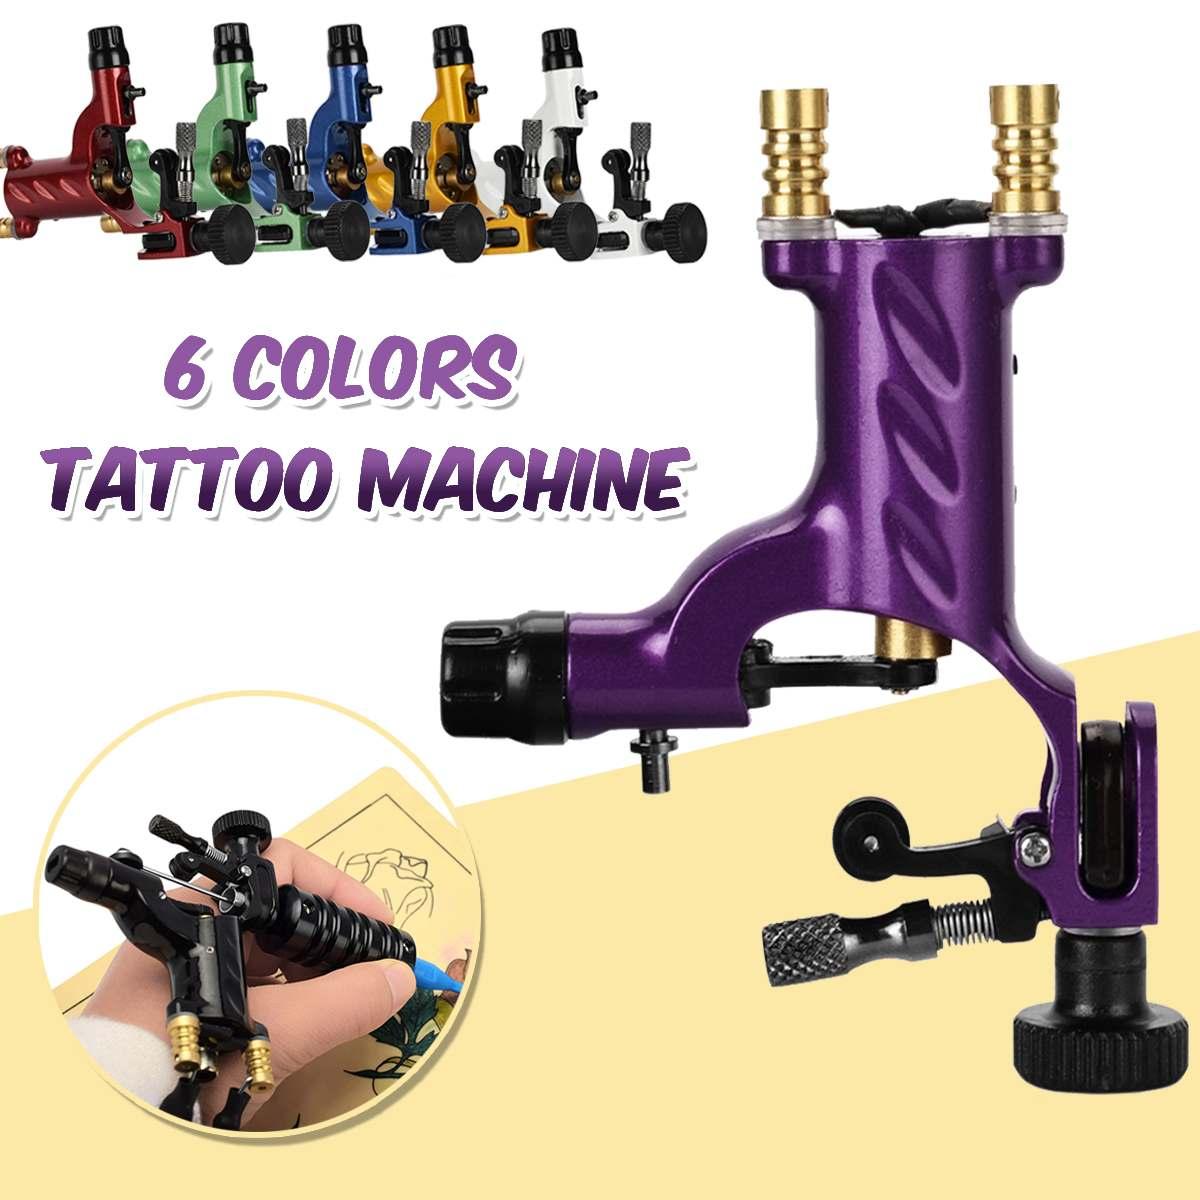 Dragonfly Rotary Tattoo Machine Professional Tattoo Machine Shadering Liner Electric Tattoo Guns Makeup Tool Artists Beginner